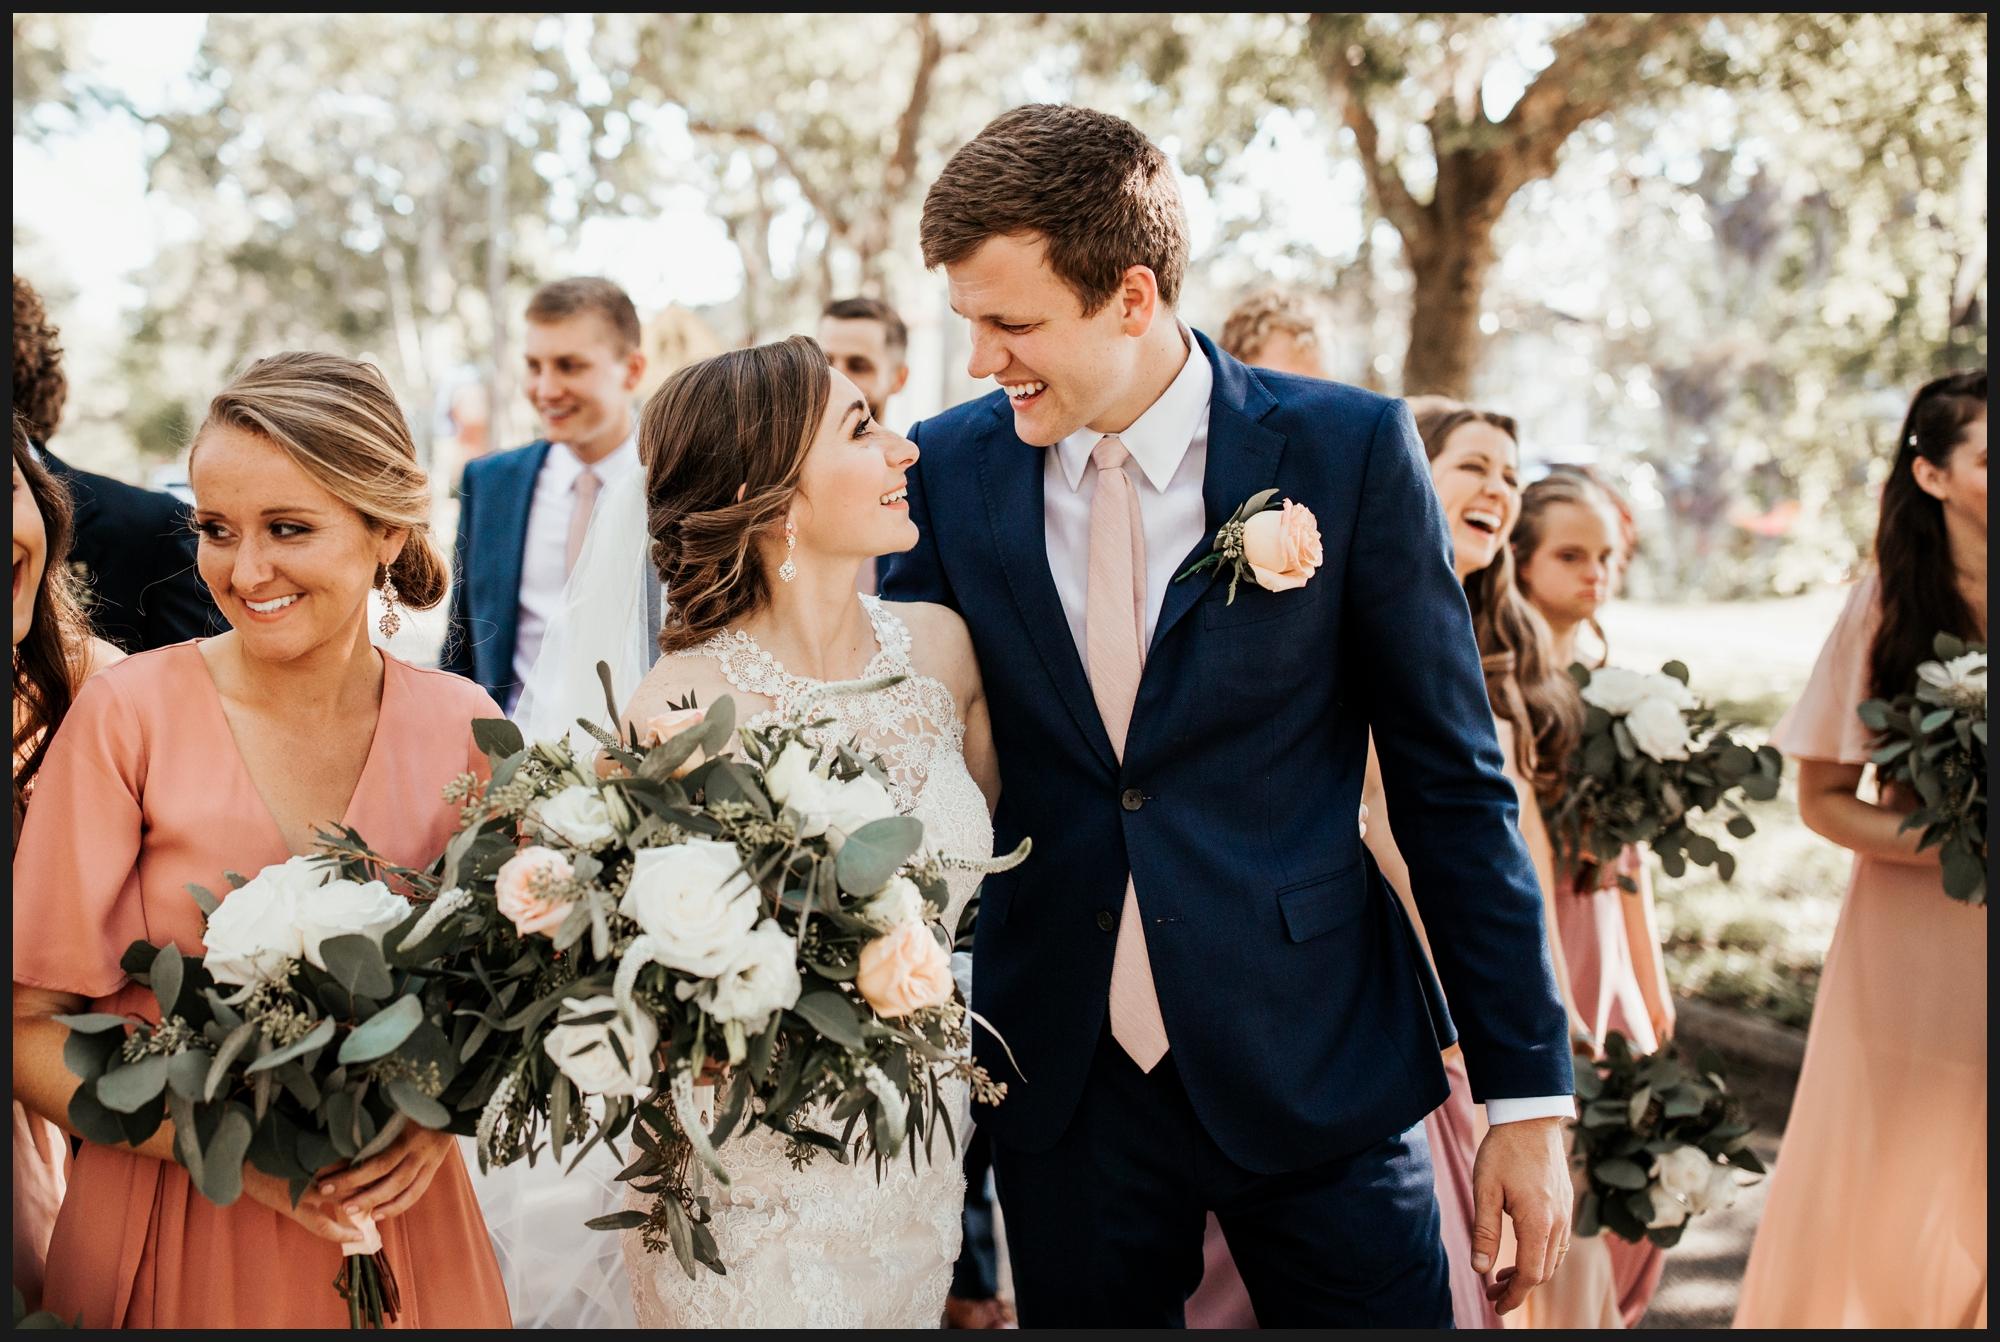 Orlando-Wedding-Photographer-destination-wedding-photographer-florida-wedding-photographer-bohemian-wedding-photographer_1754.jpg